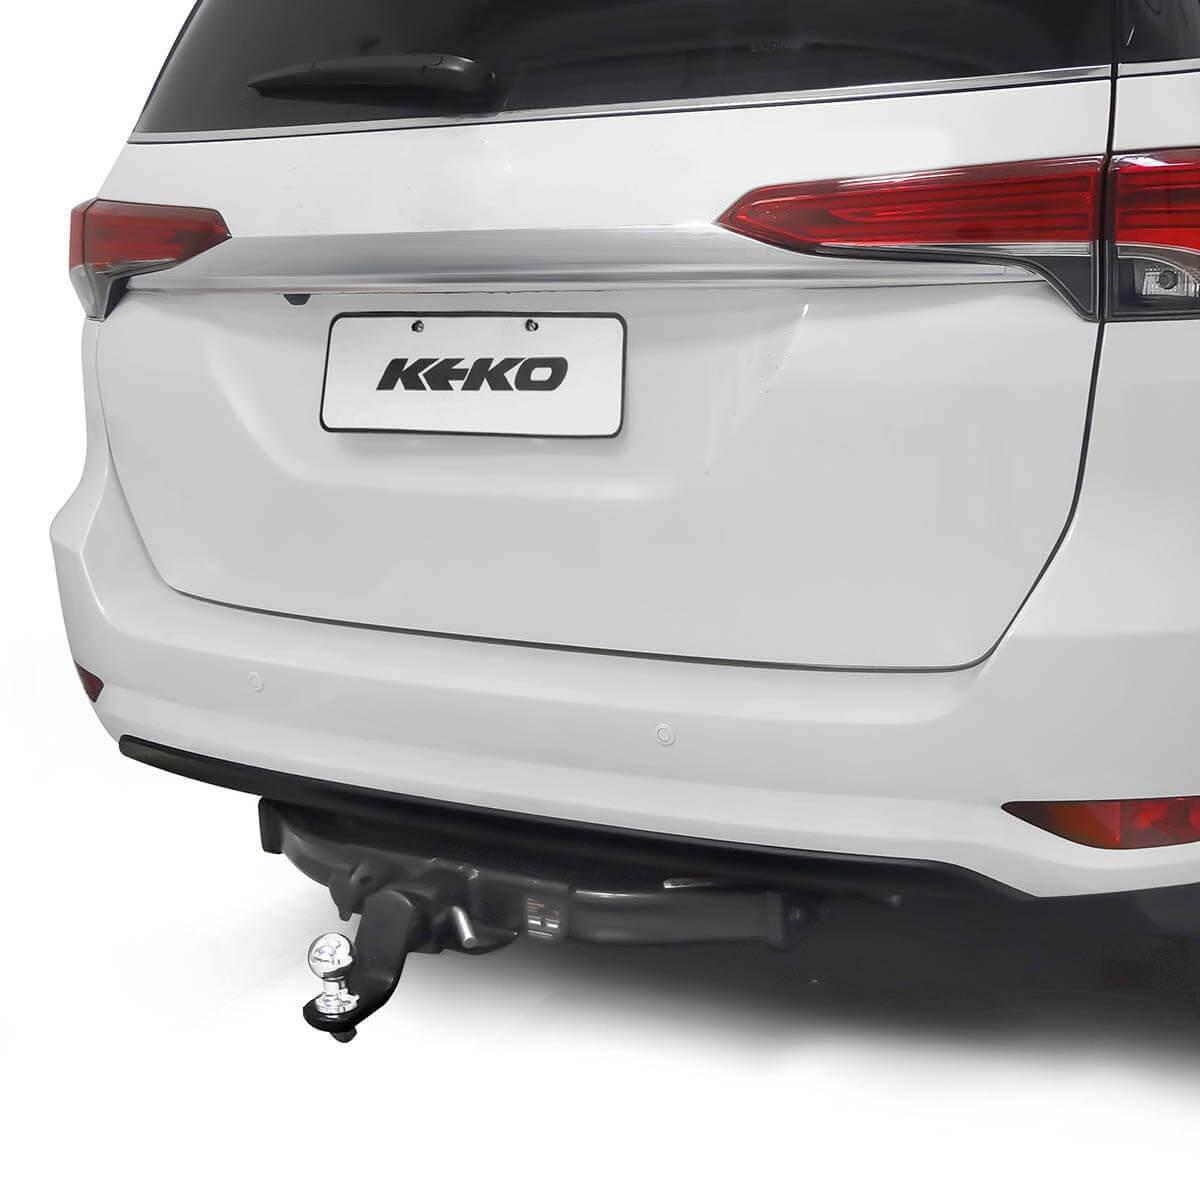 Engate de reboque Nova SW4 2016 a 2020 Keko K1 removível 1500 kg